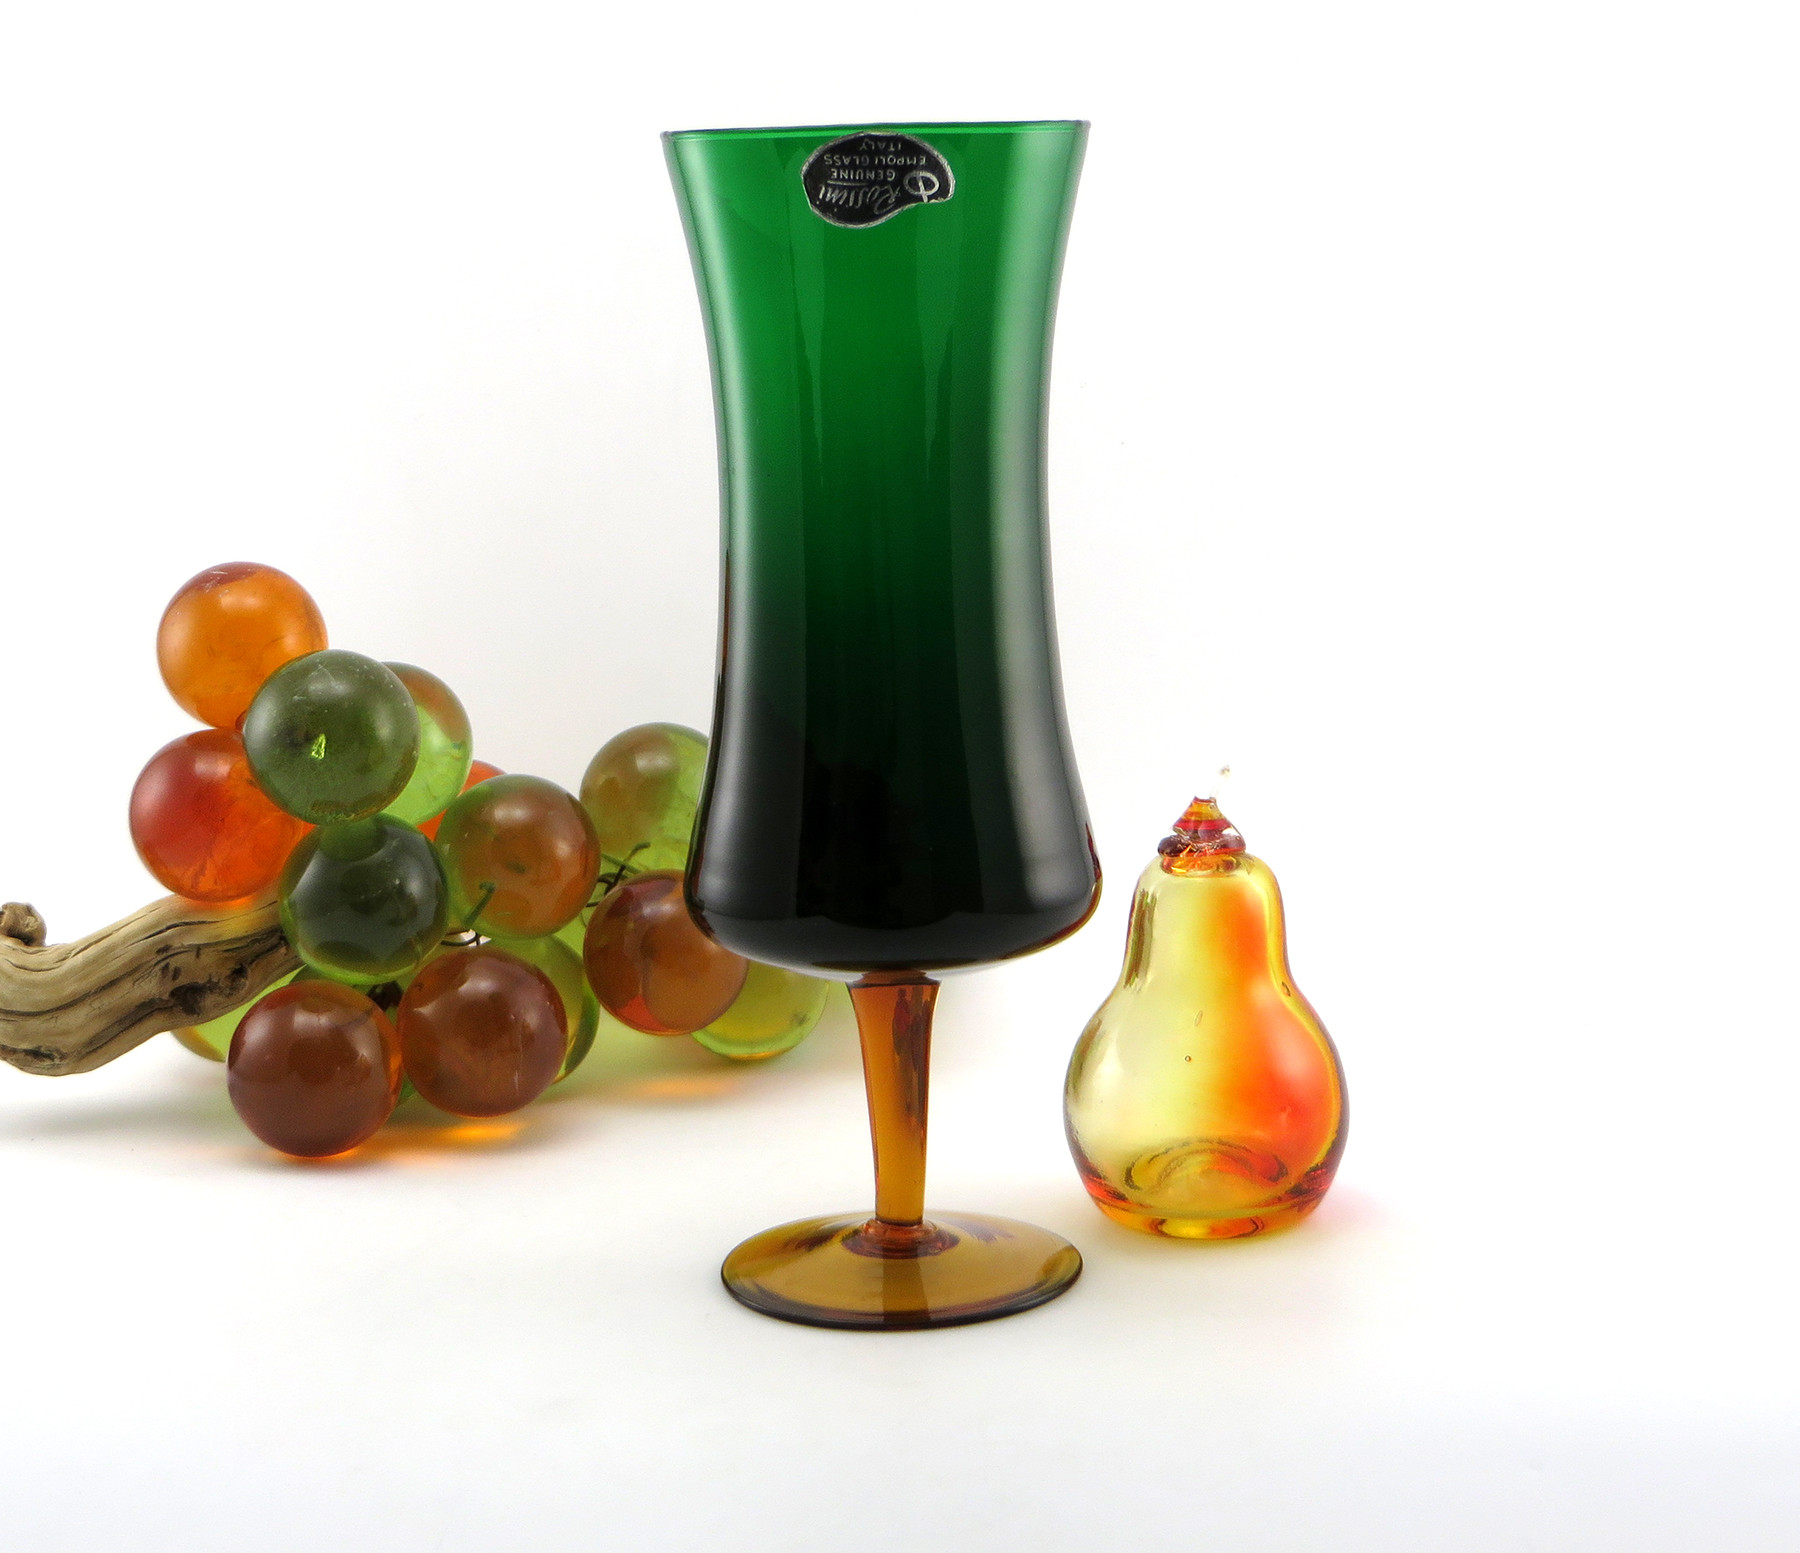 venetian glass bowls vases of rossini empoli art glass retro modern vase with label retro art glass within rossini empoli art glass retro modern vase with label